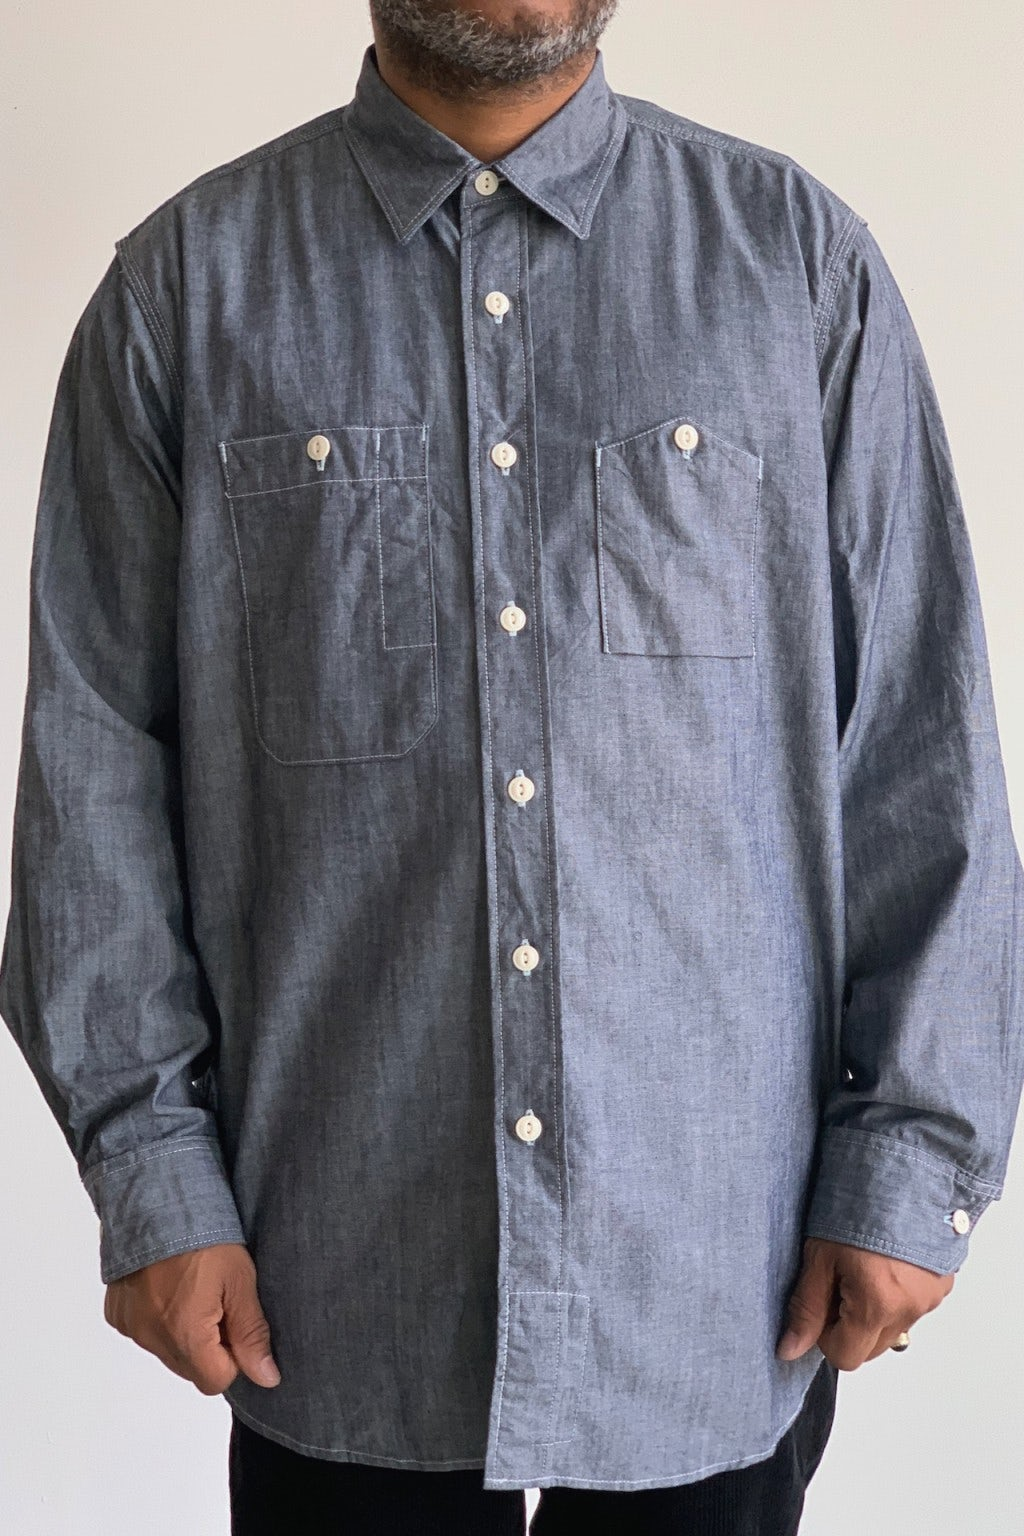 Engineered Garments Work Shirt Indigo Cotton Chambray